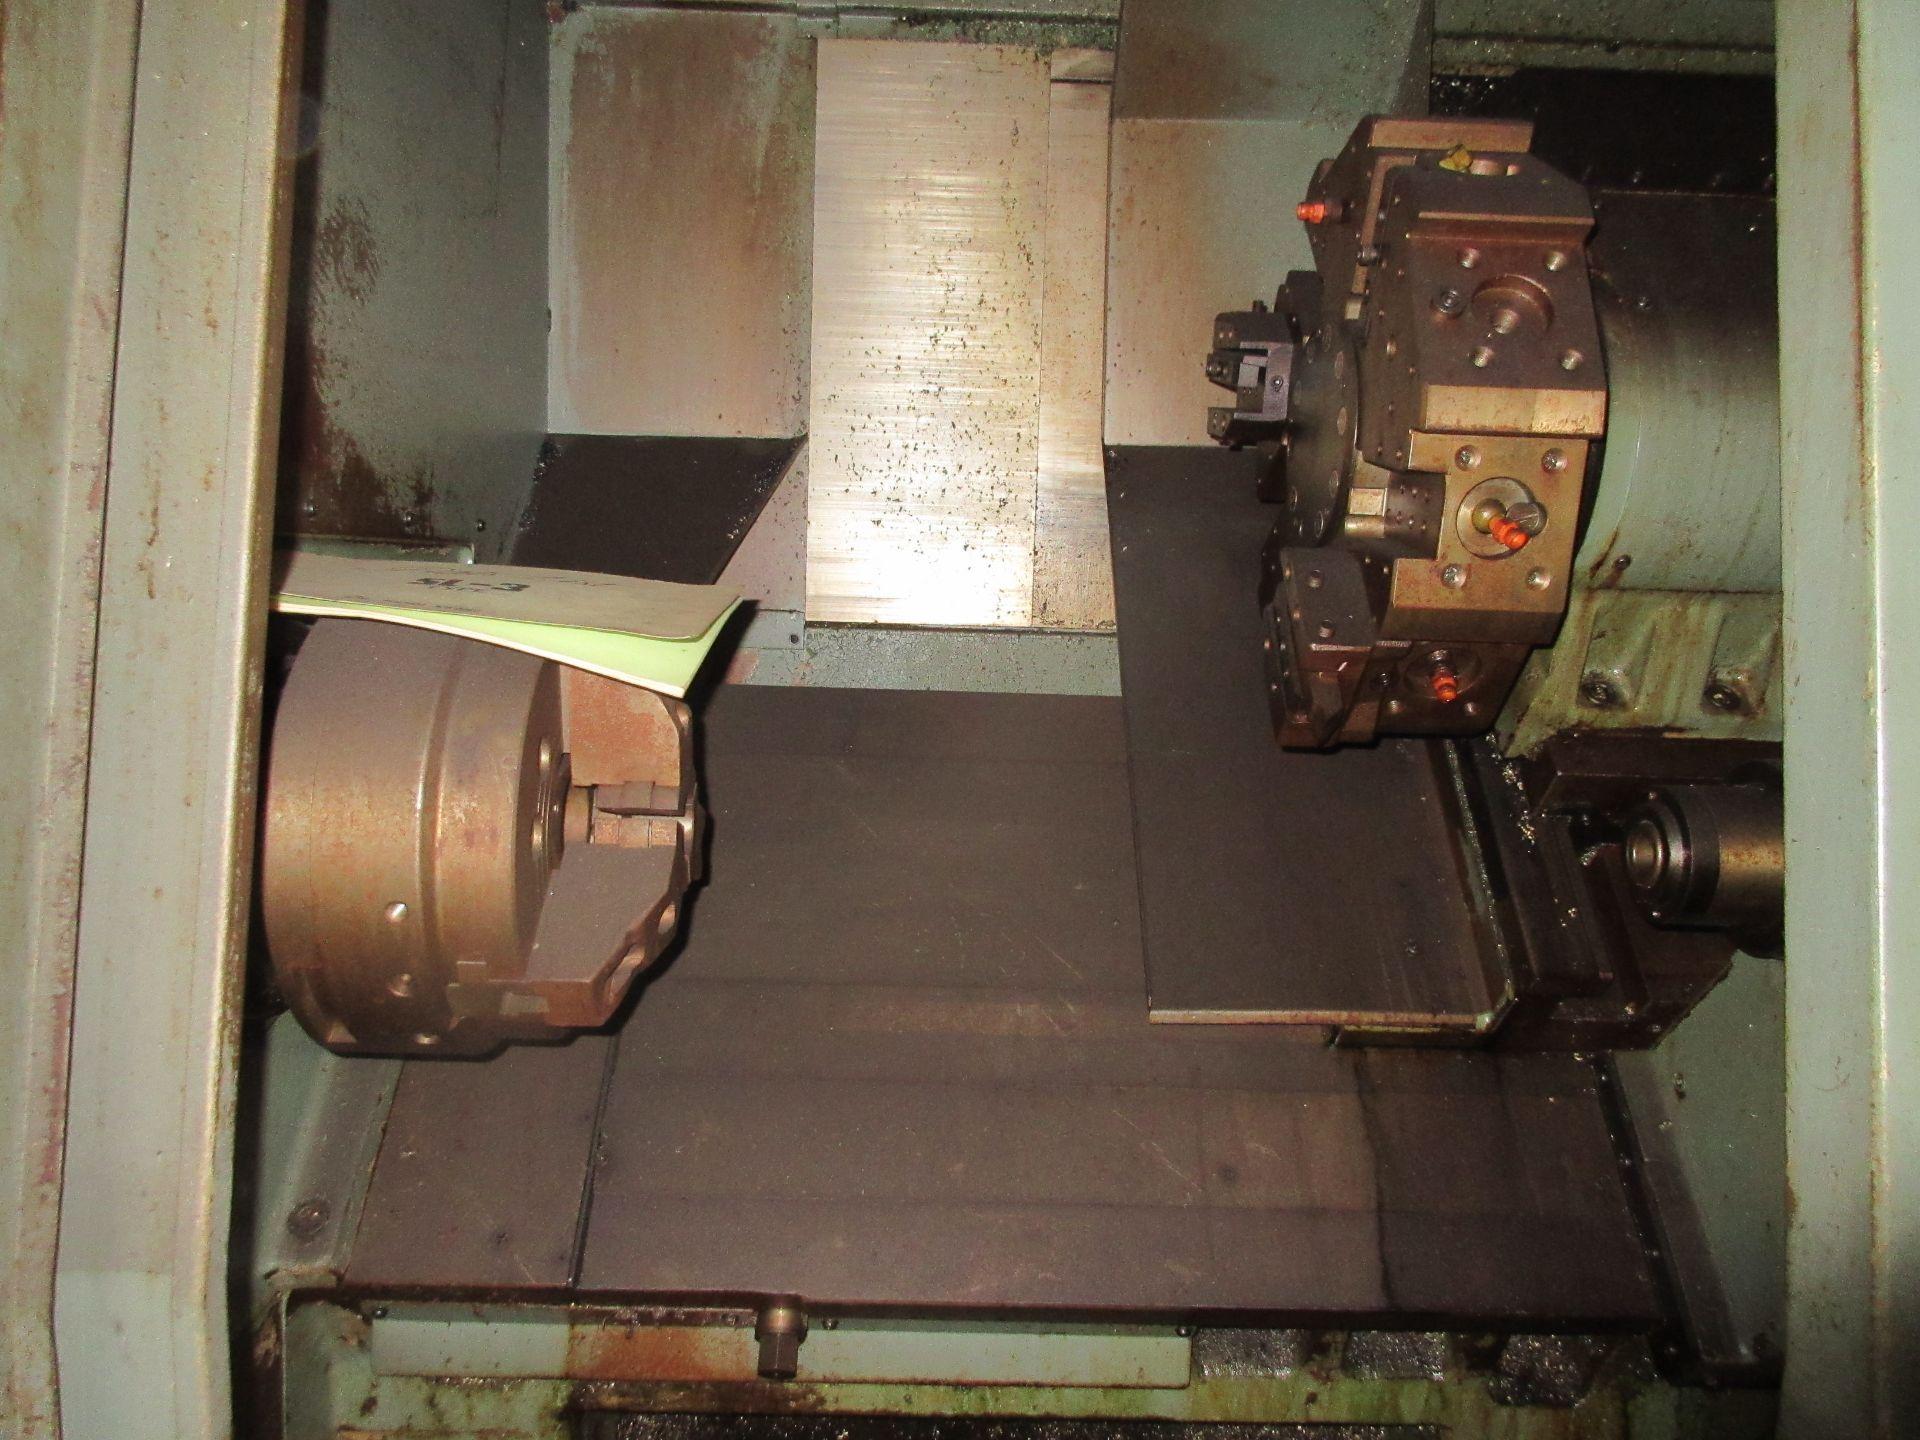 (1) Mori Seiki SL-3H S/N 3360 W/ Chip Conveyor - Image 6 of 8